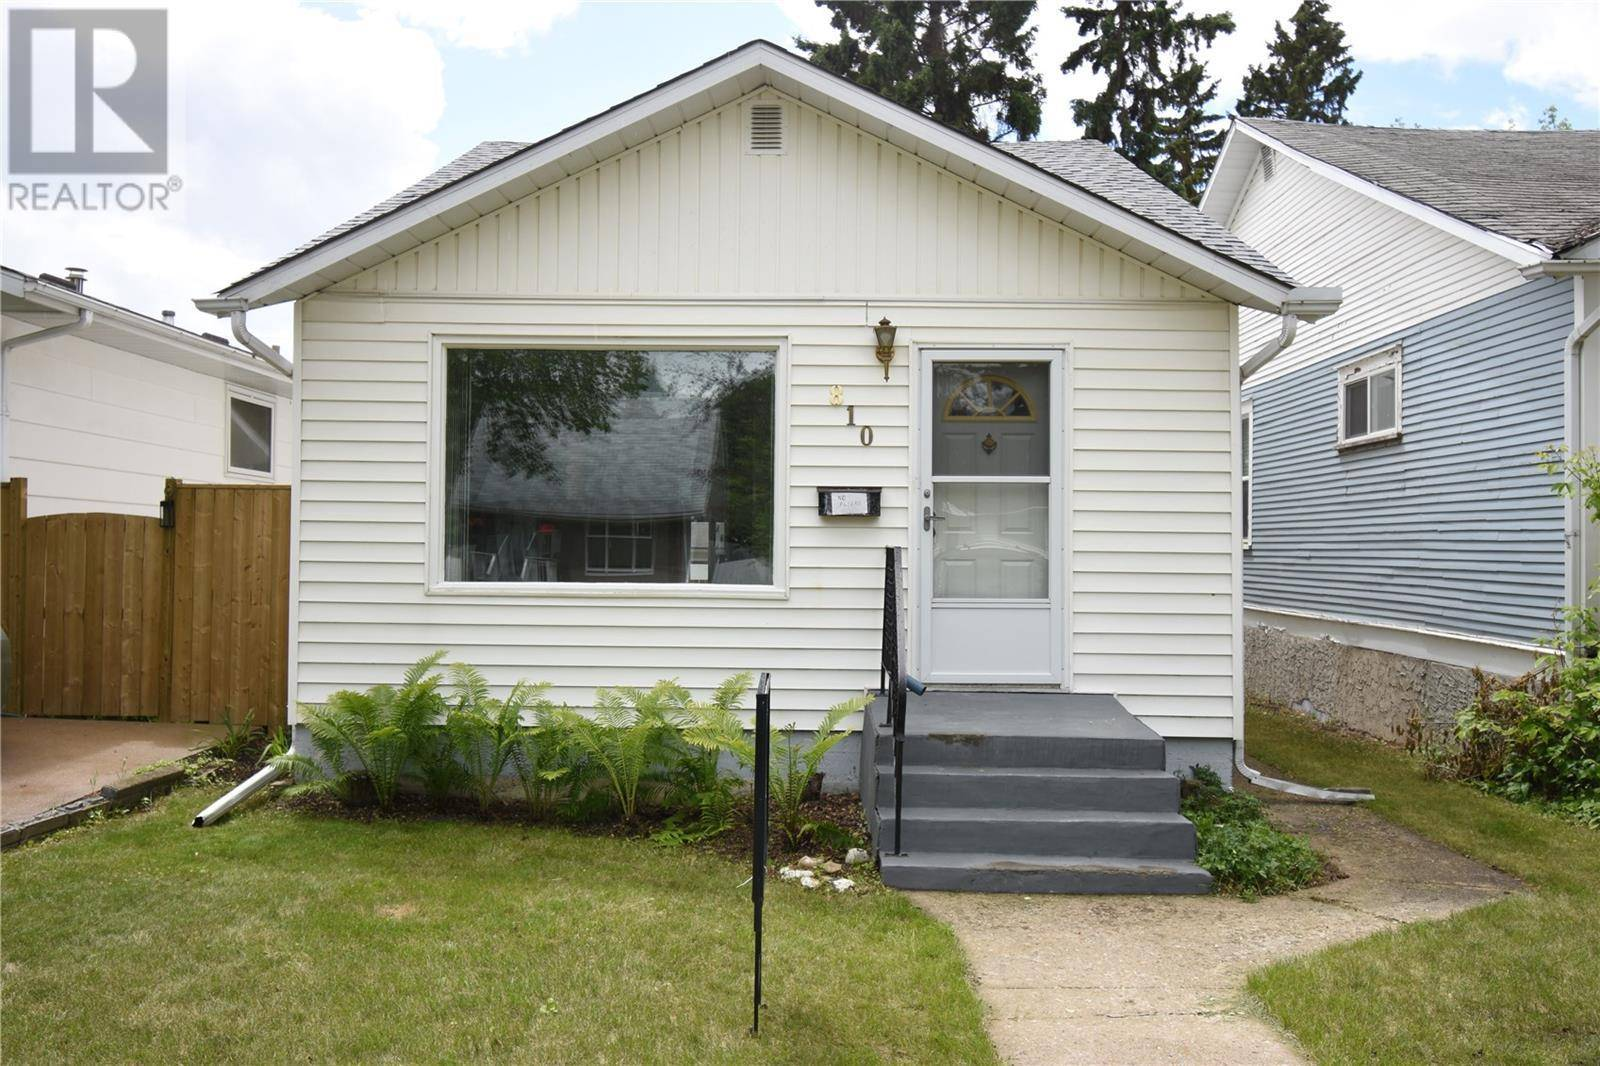 House for sale at 810 6th St E Saskatoon Saskatchewan - MLS: SK785064